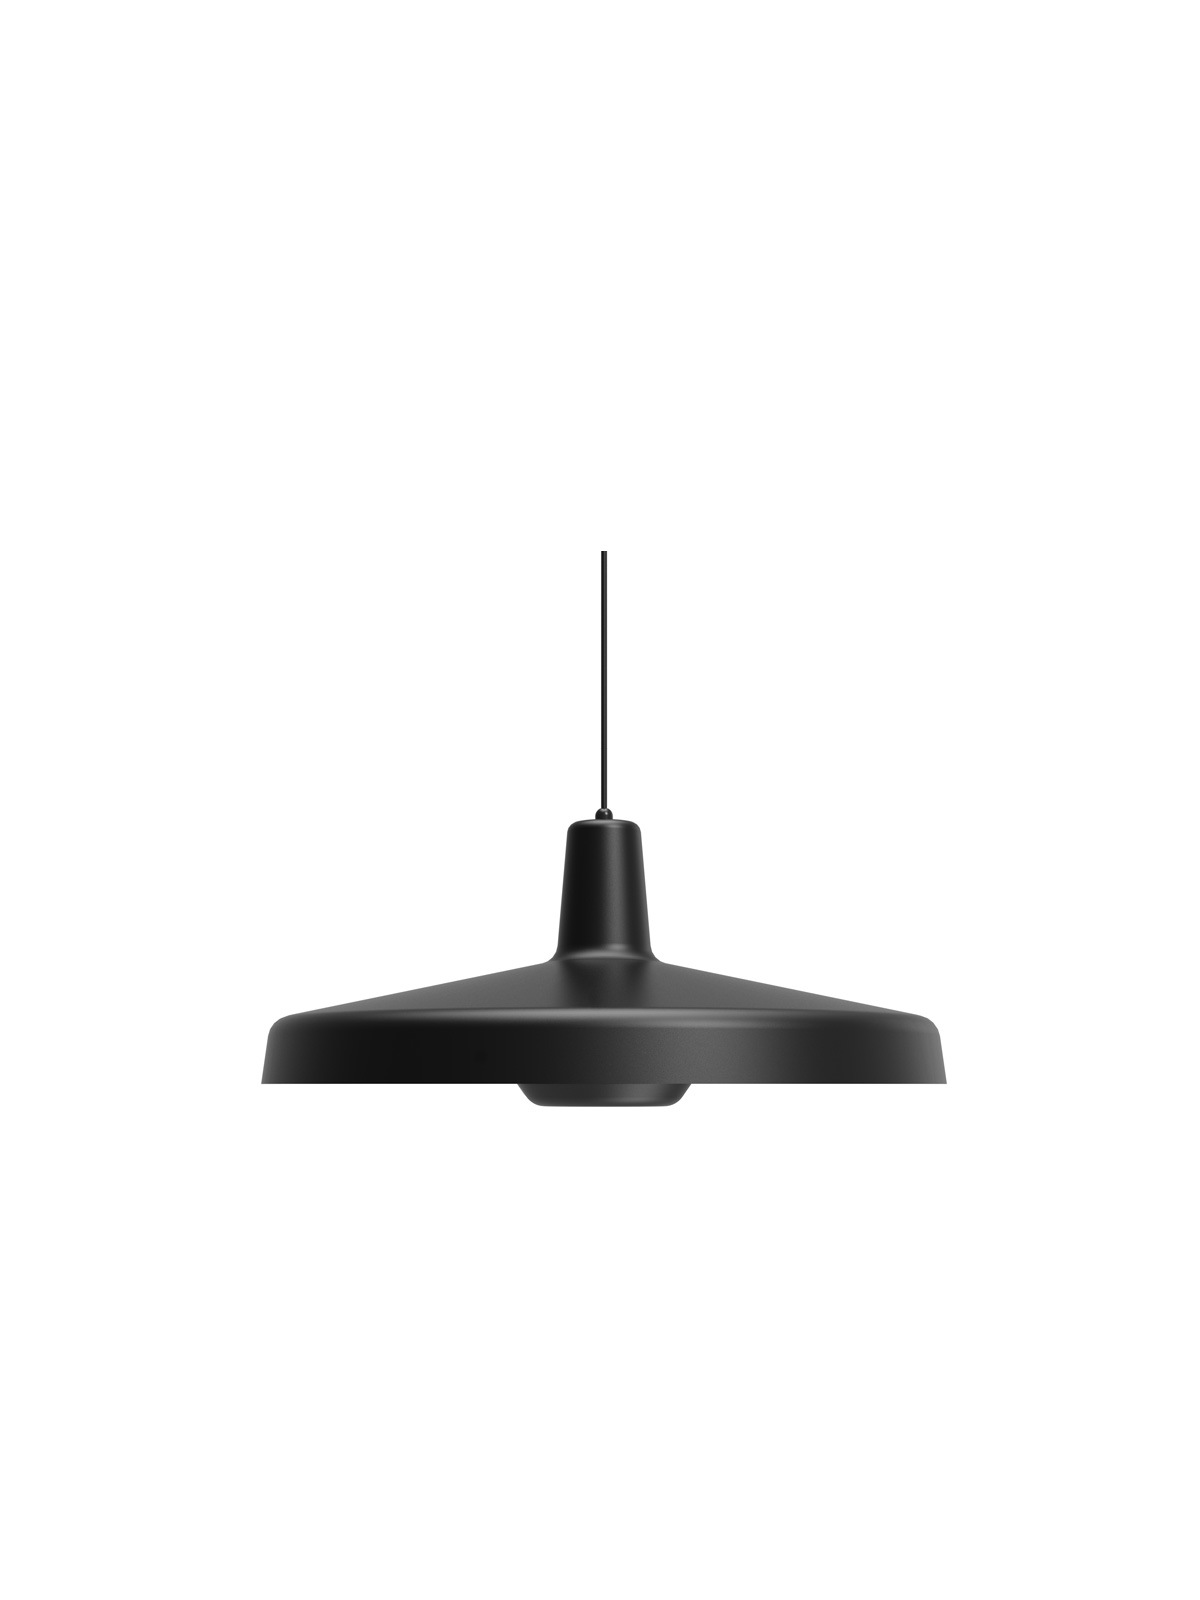 Arigato Pendant Large Pendelleuchte Grupa Products DesignOrt Berlin Lampen Leuchten